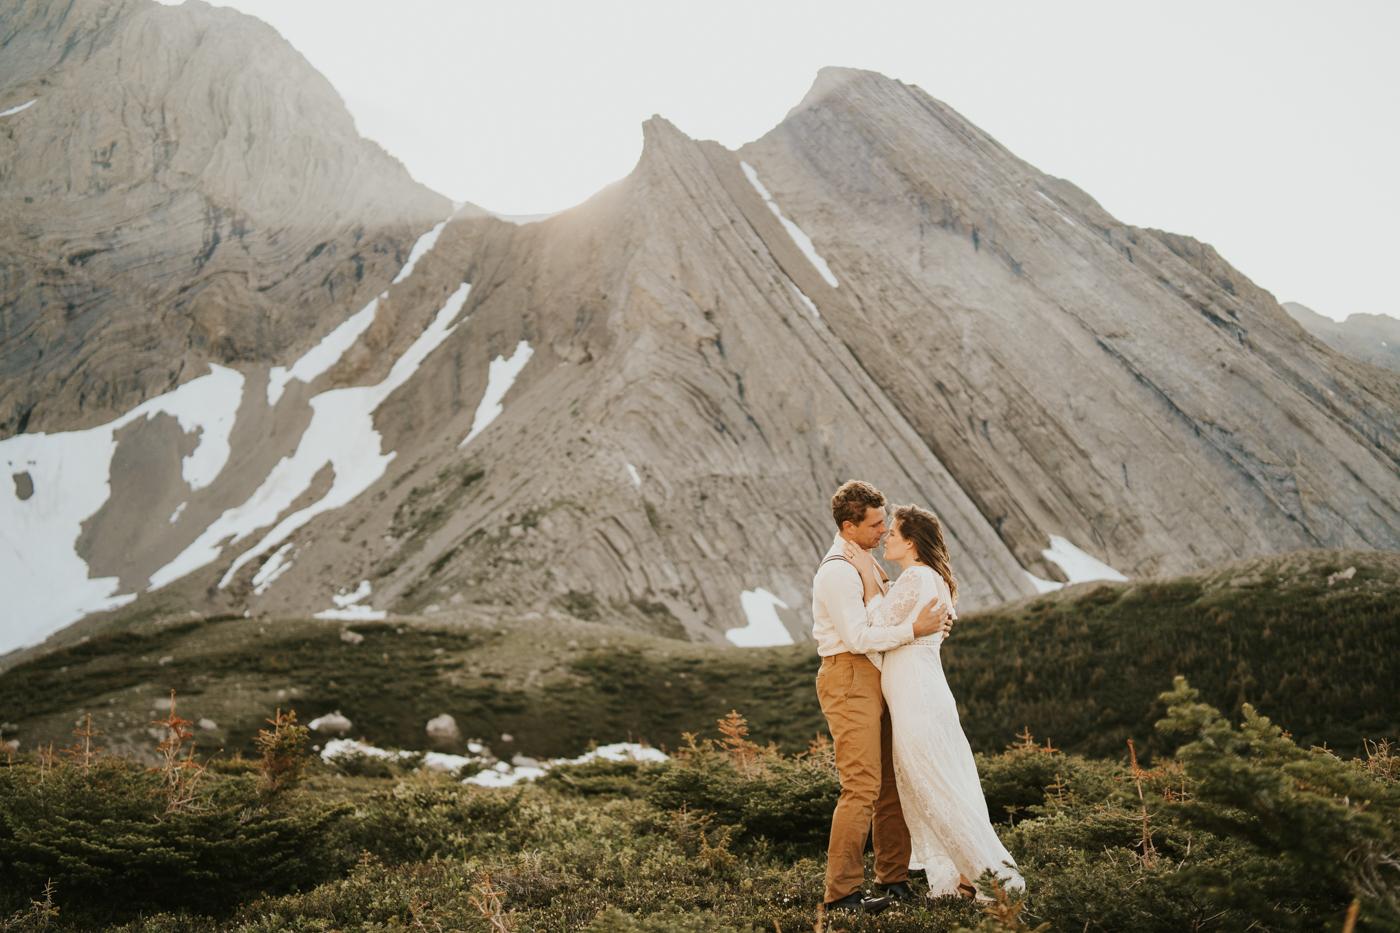 tyraephotography_photographer_wedding_elopement_engagement_photography-07950.jpg